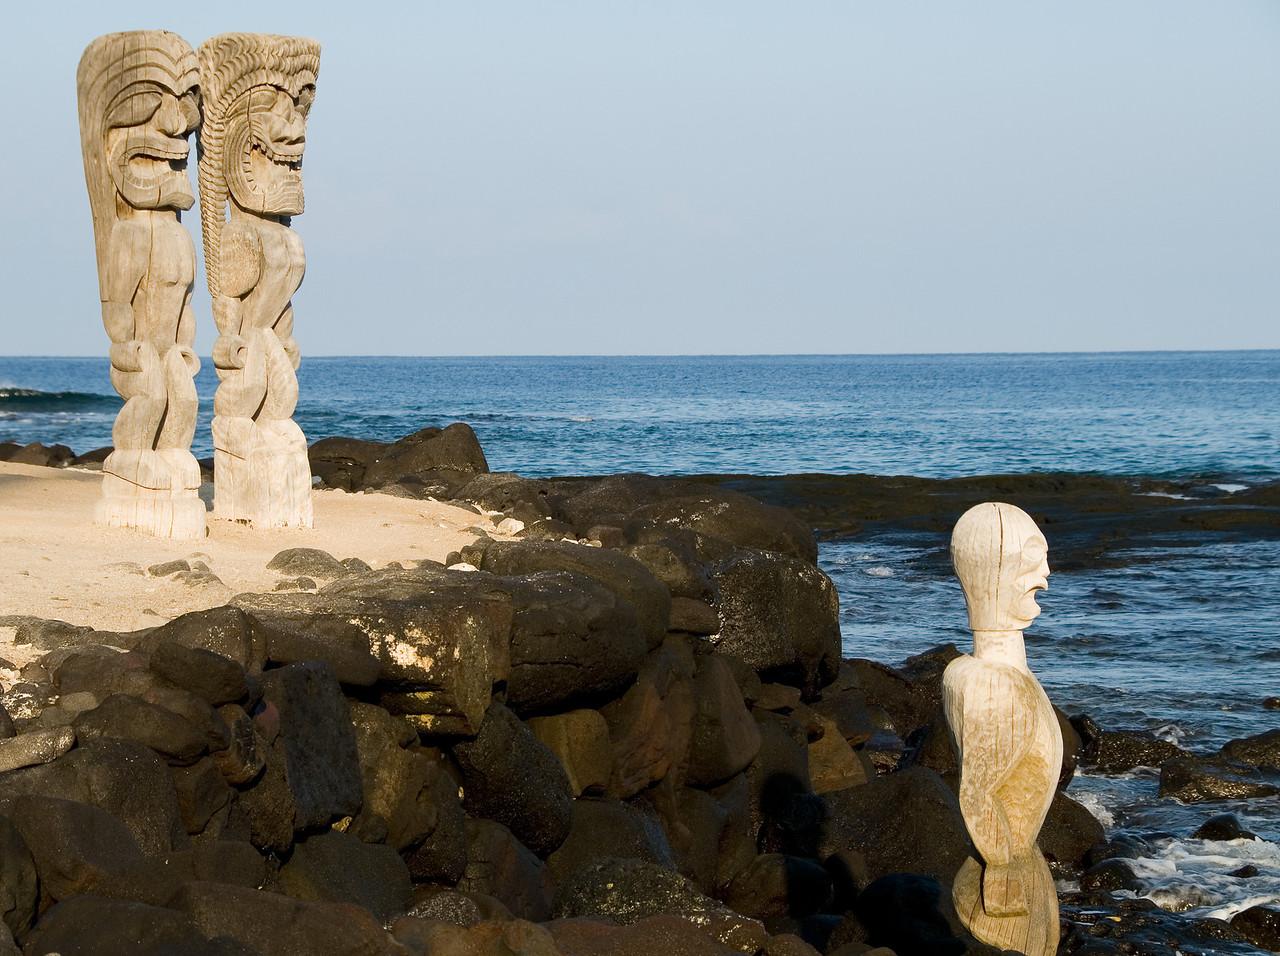 Tiki idols guarding a royal burial site at Pu'uhonua O Honaunau National Historic Park (City of Refuge)